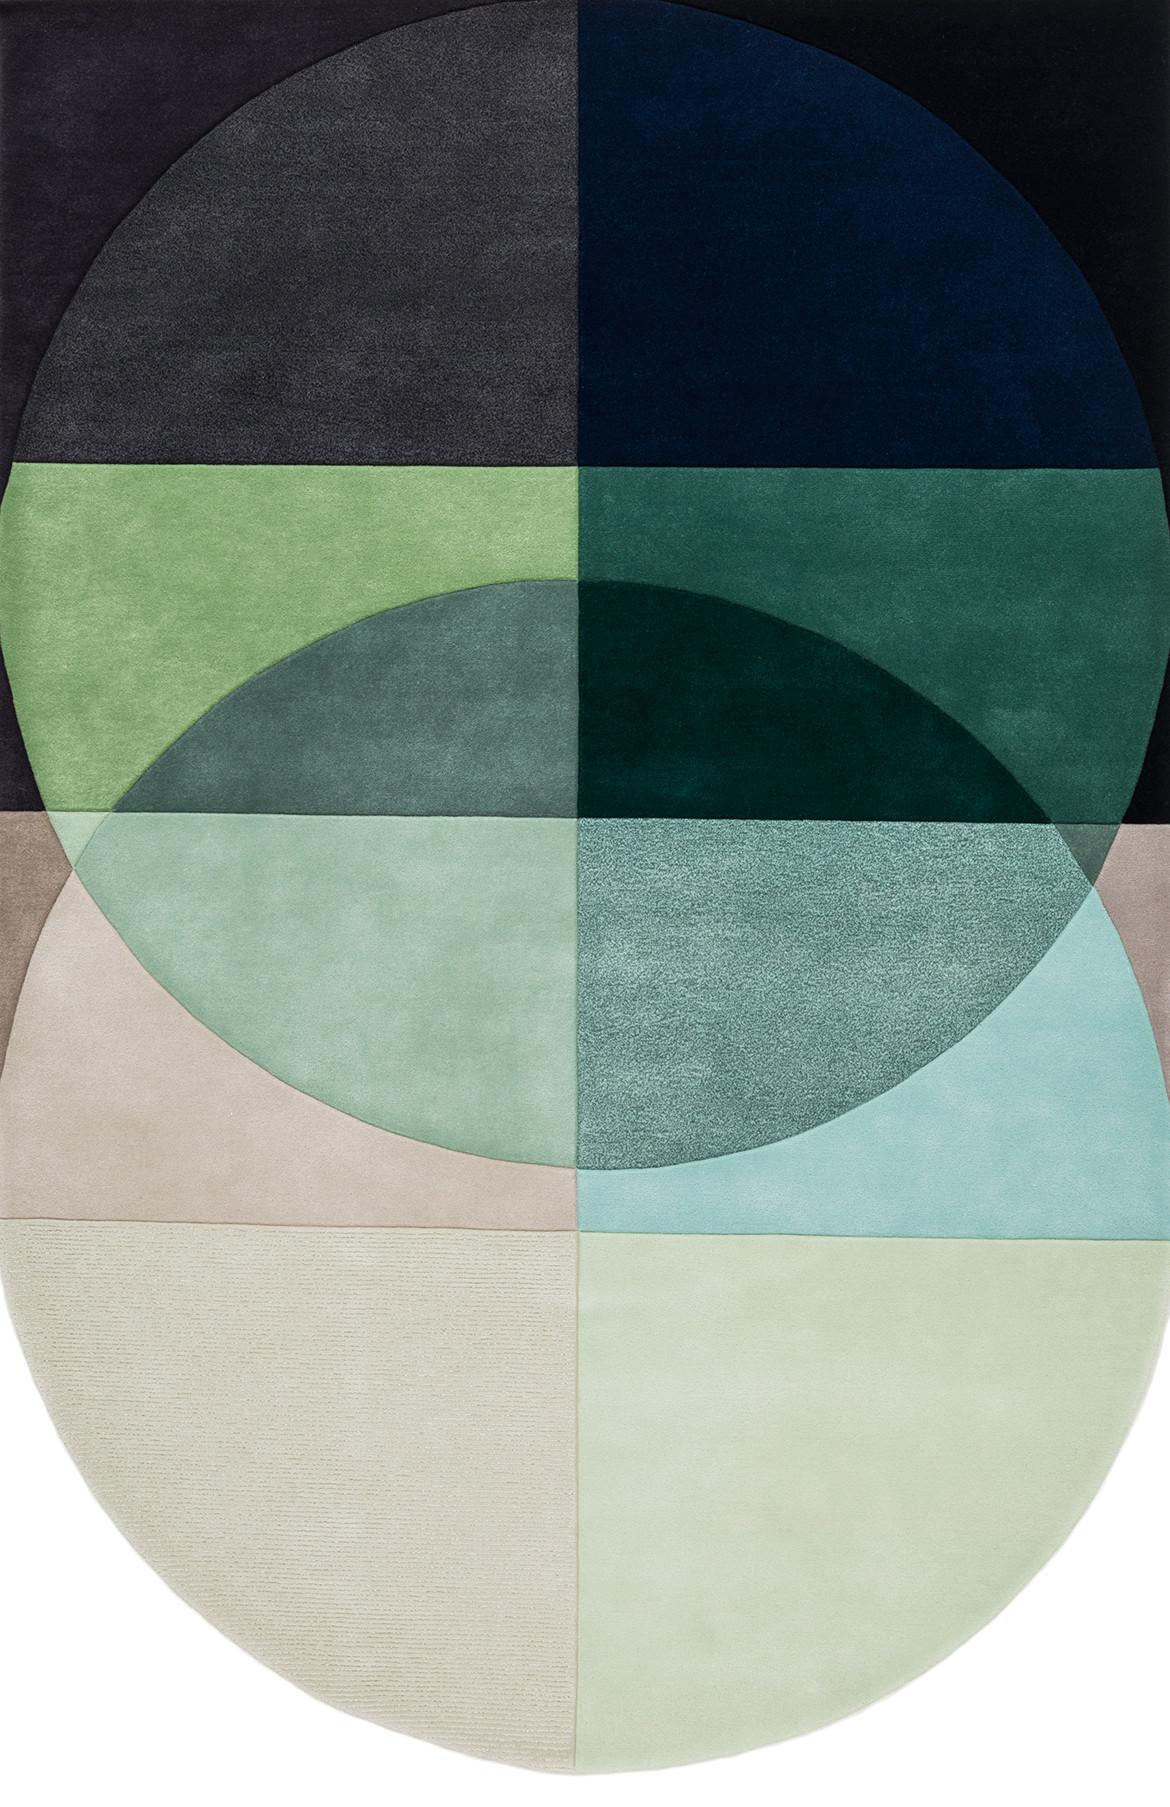 Designer Rugs Bernabeifreeman CC Richard Whitman ocean colour